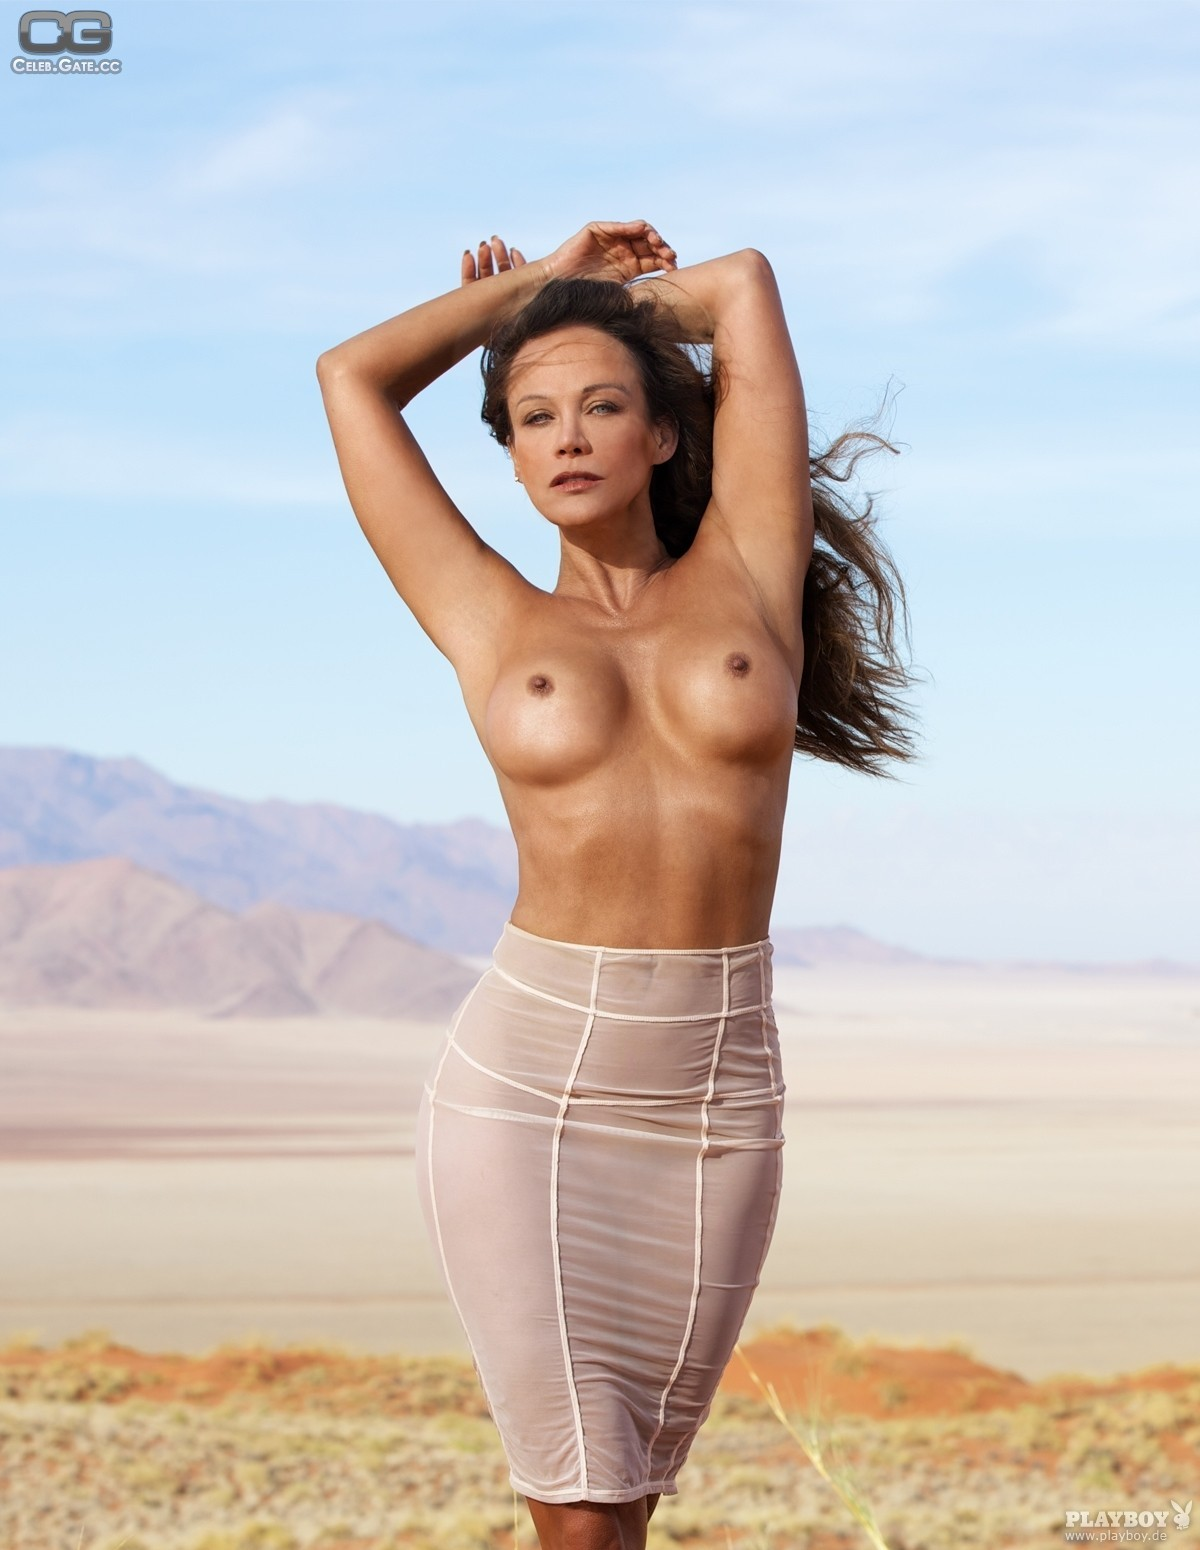 Startseite  Playboy